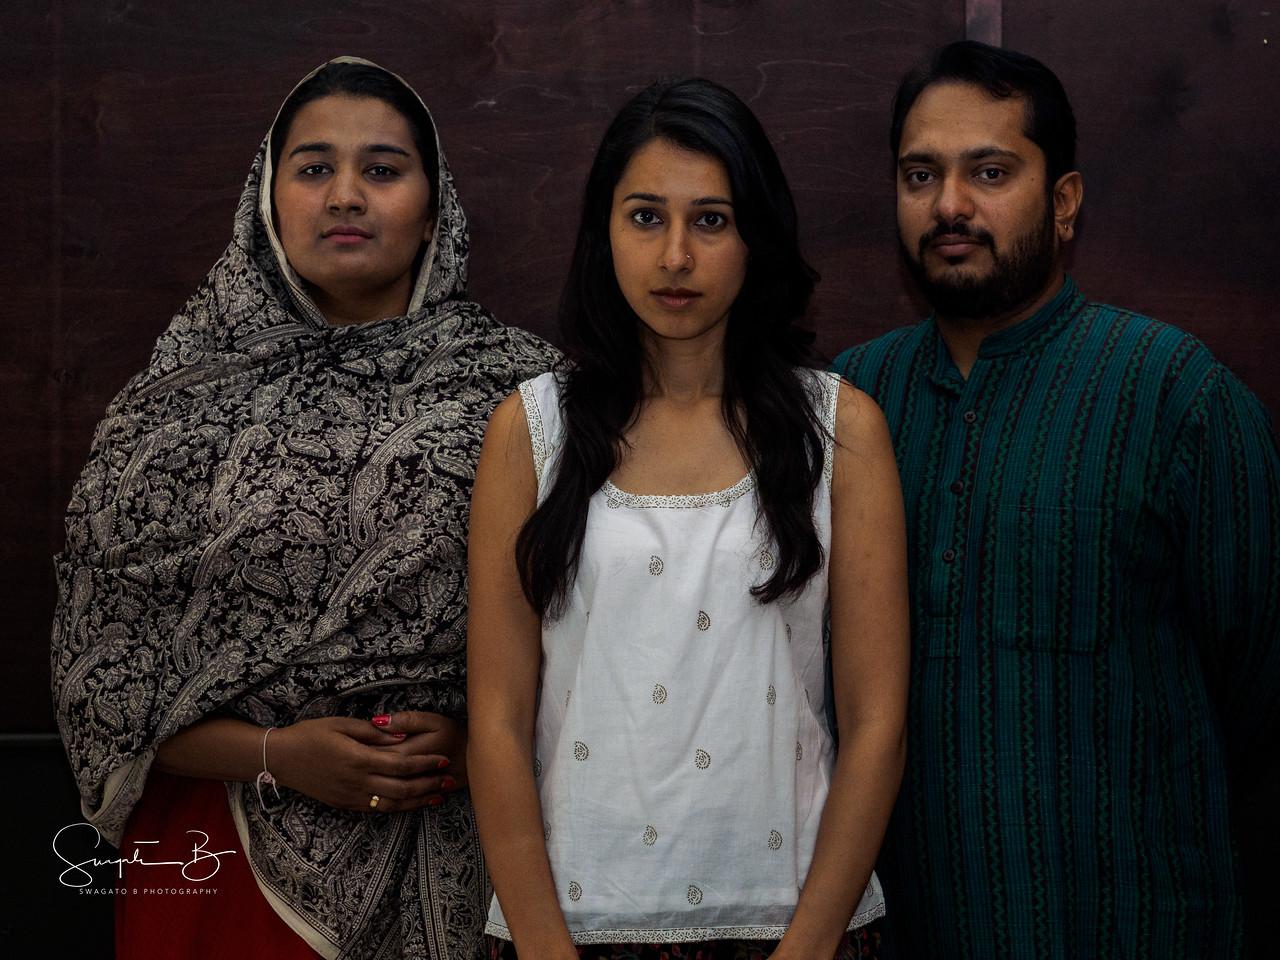 A family in despair